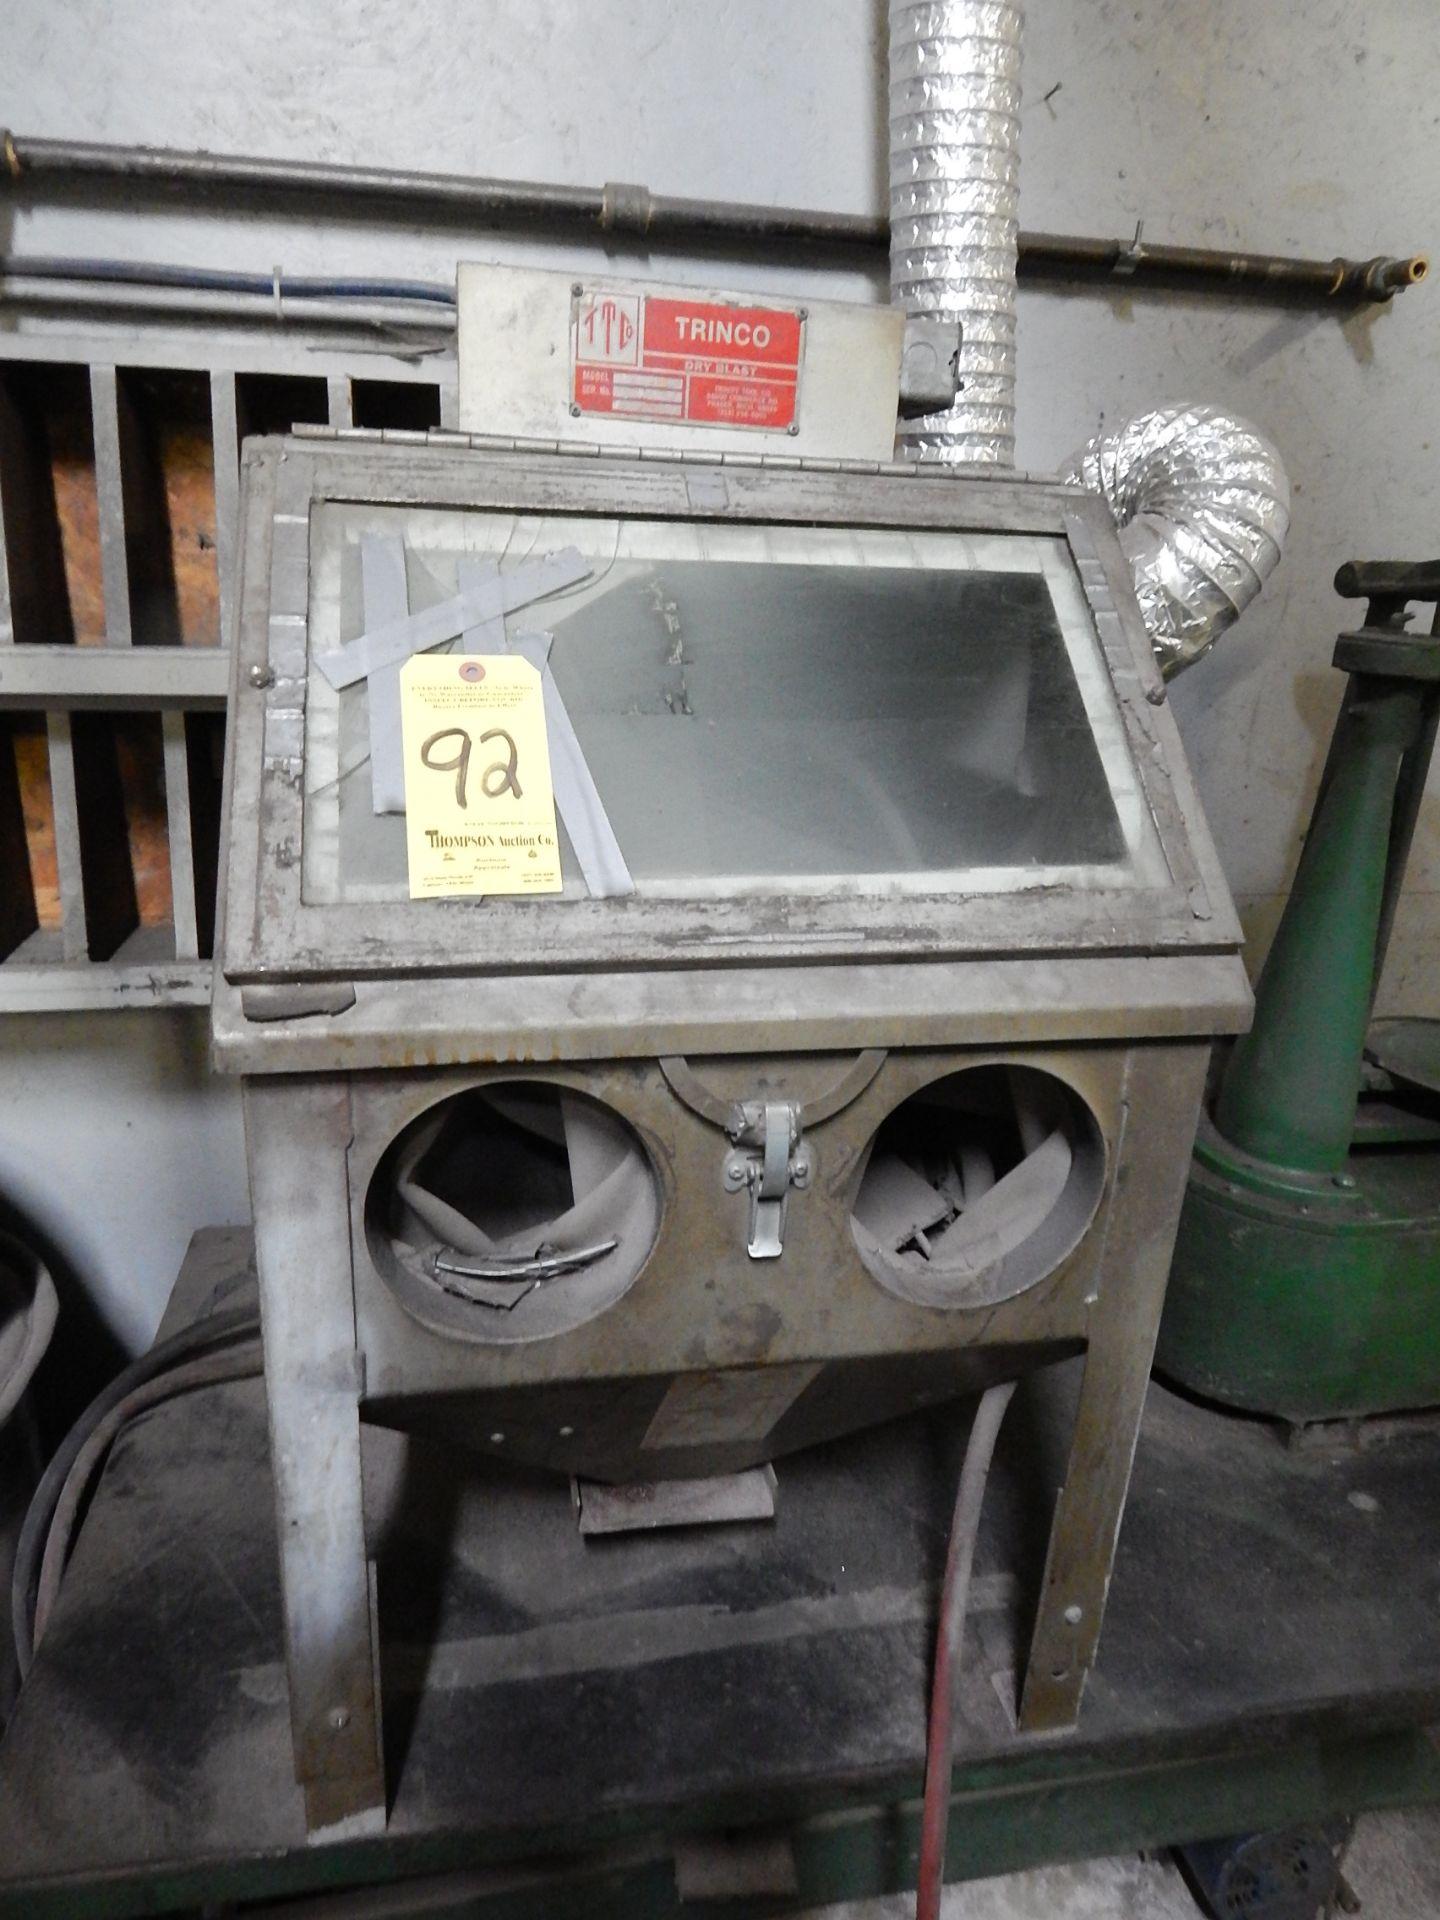 Lot 92 - Trinco Model 20 Sand Blast Cabinet